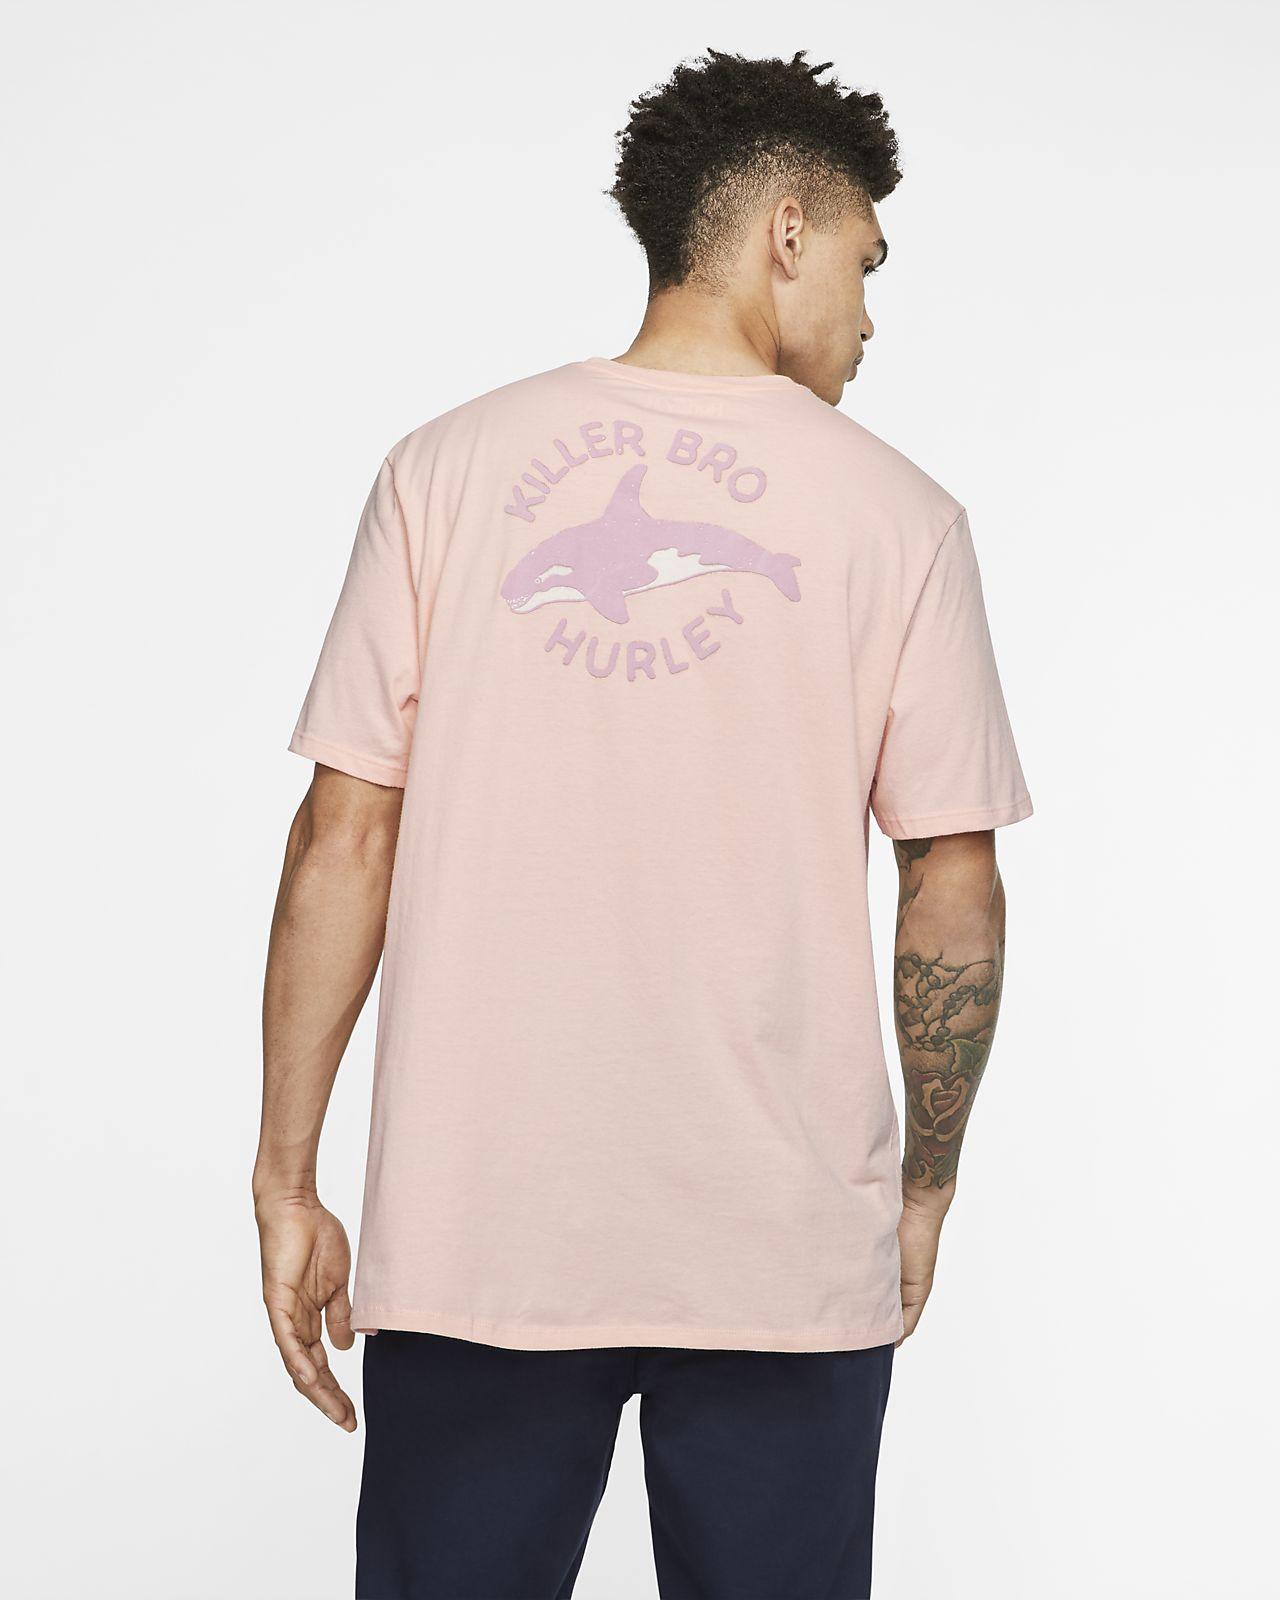 Męski T-Shirt Premium Fit Hurley Premium Killer Bro Pocket